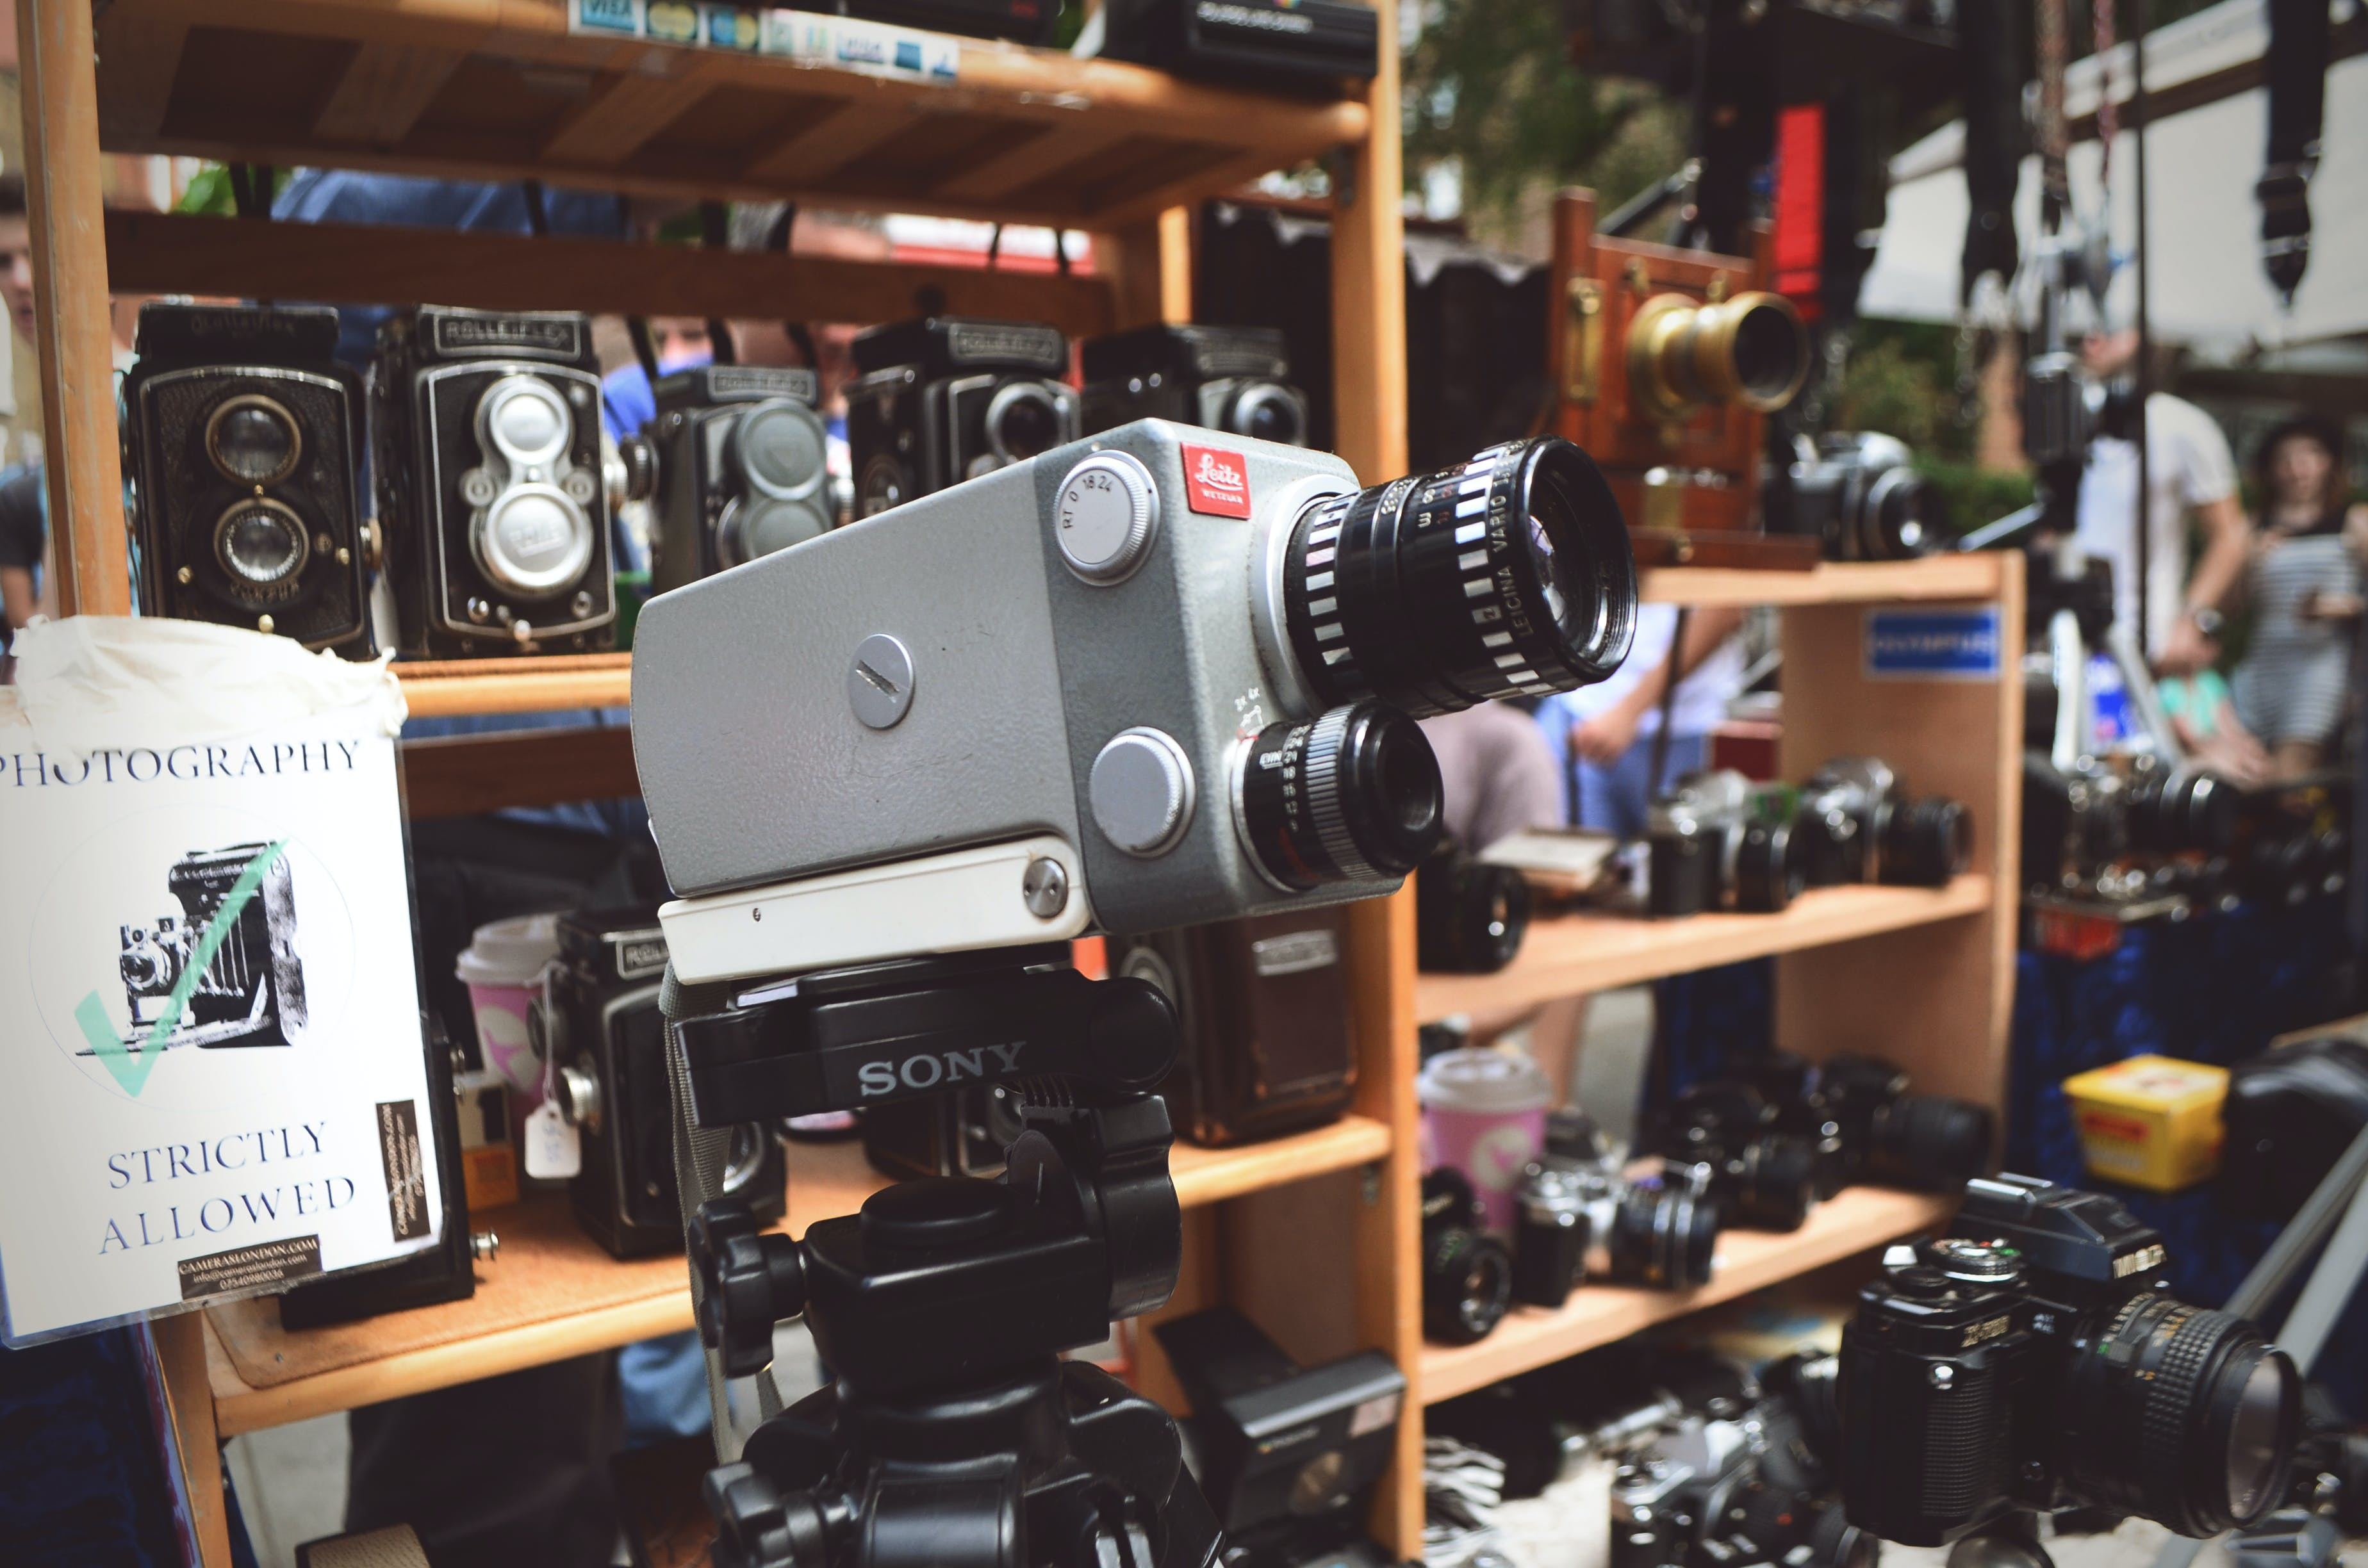 Black and Gray Sony Video Camera